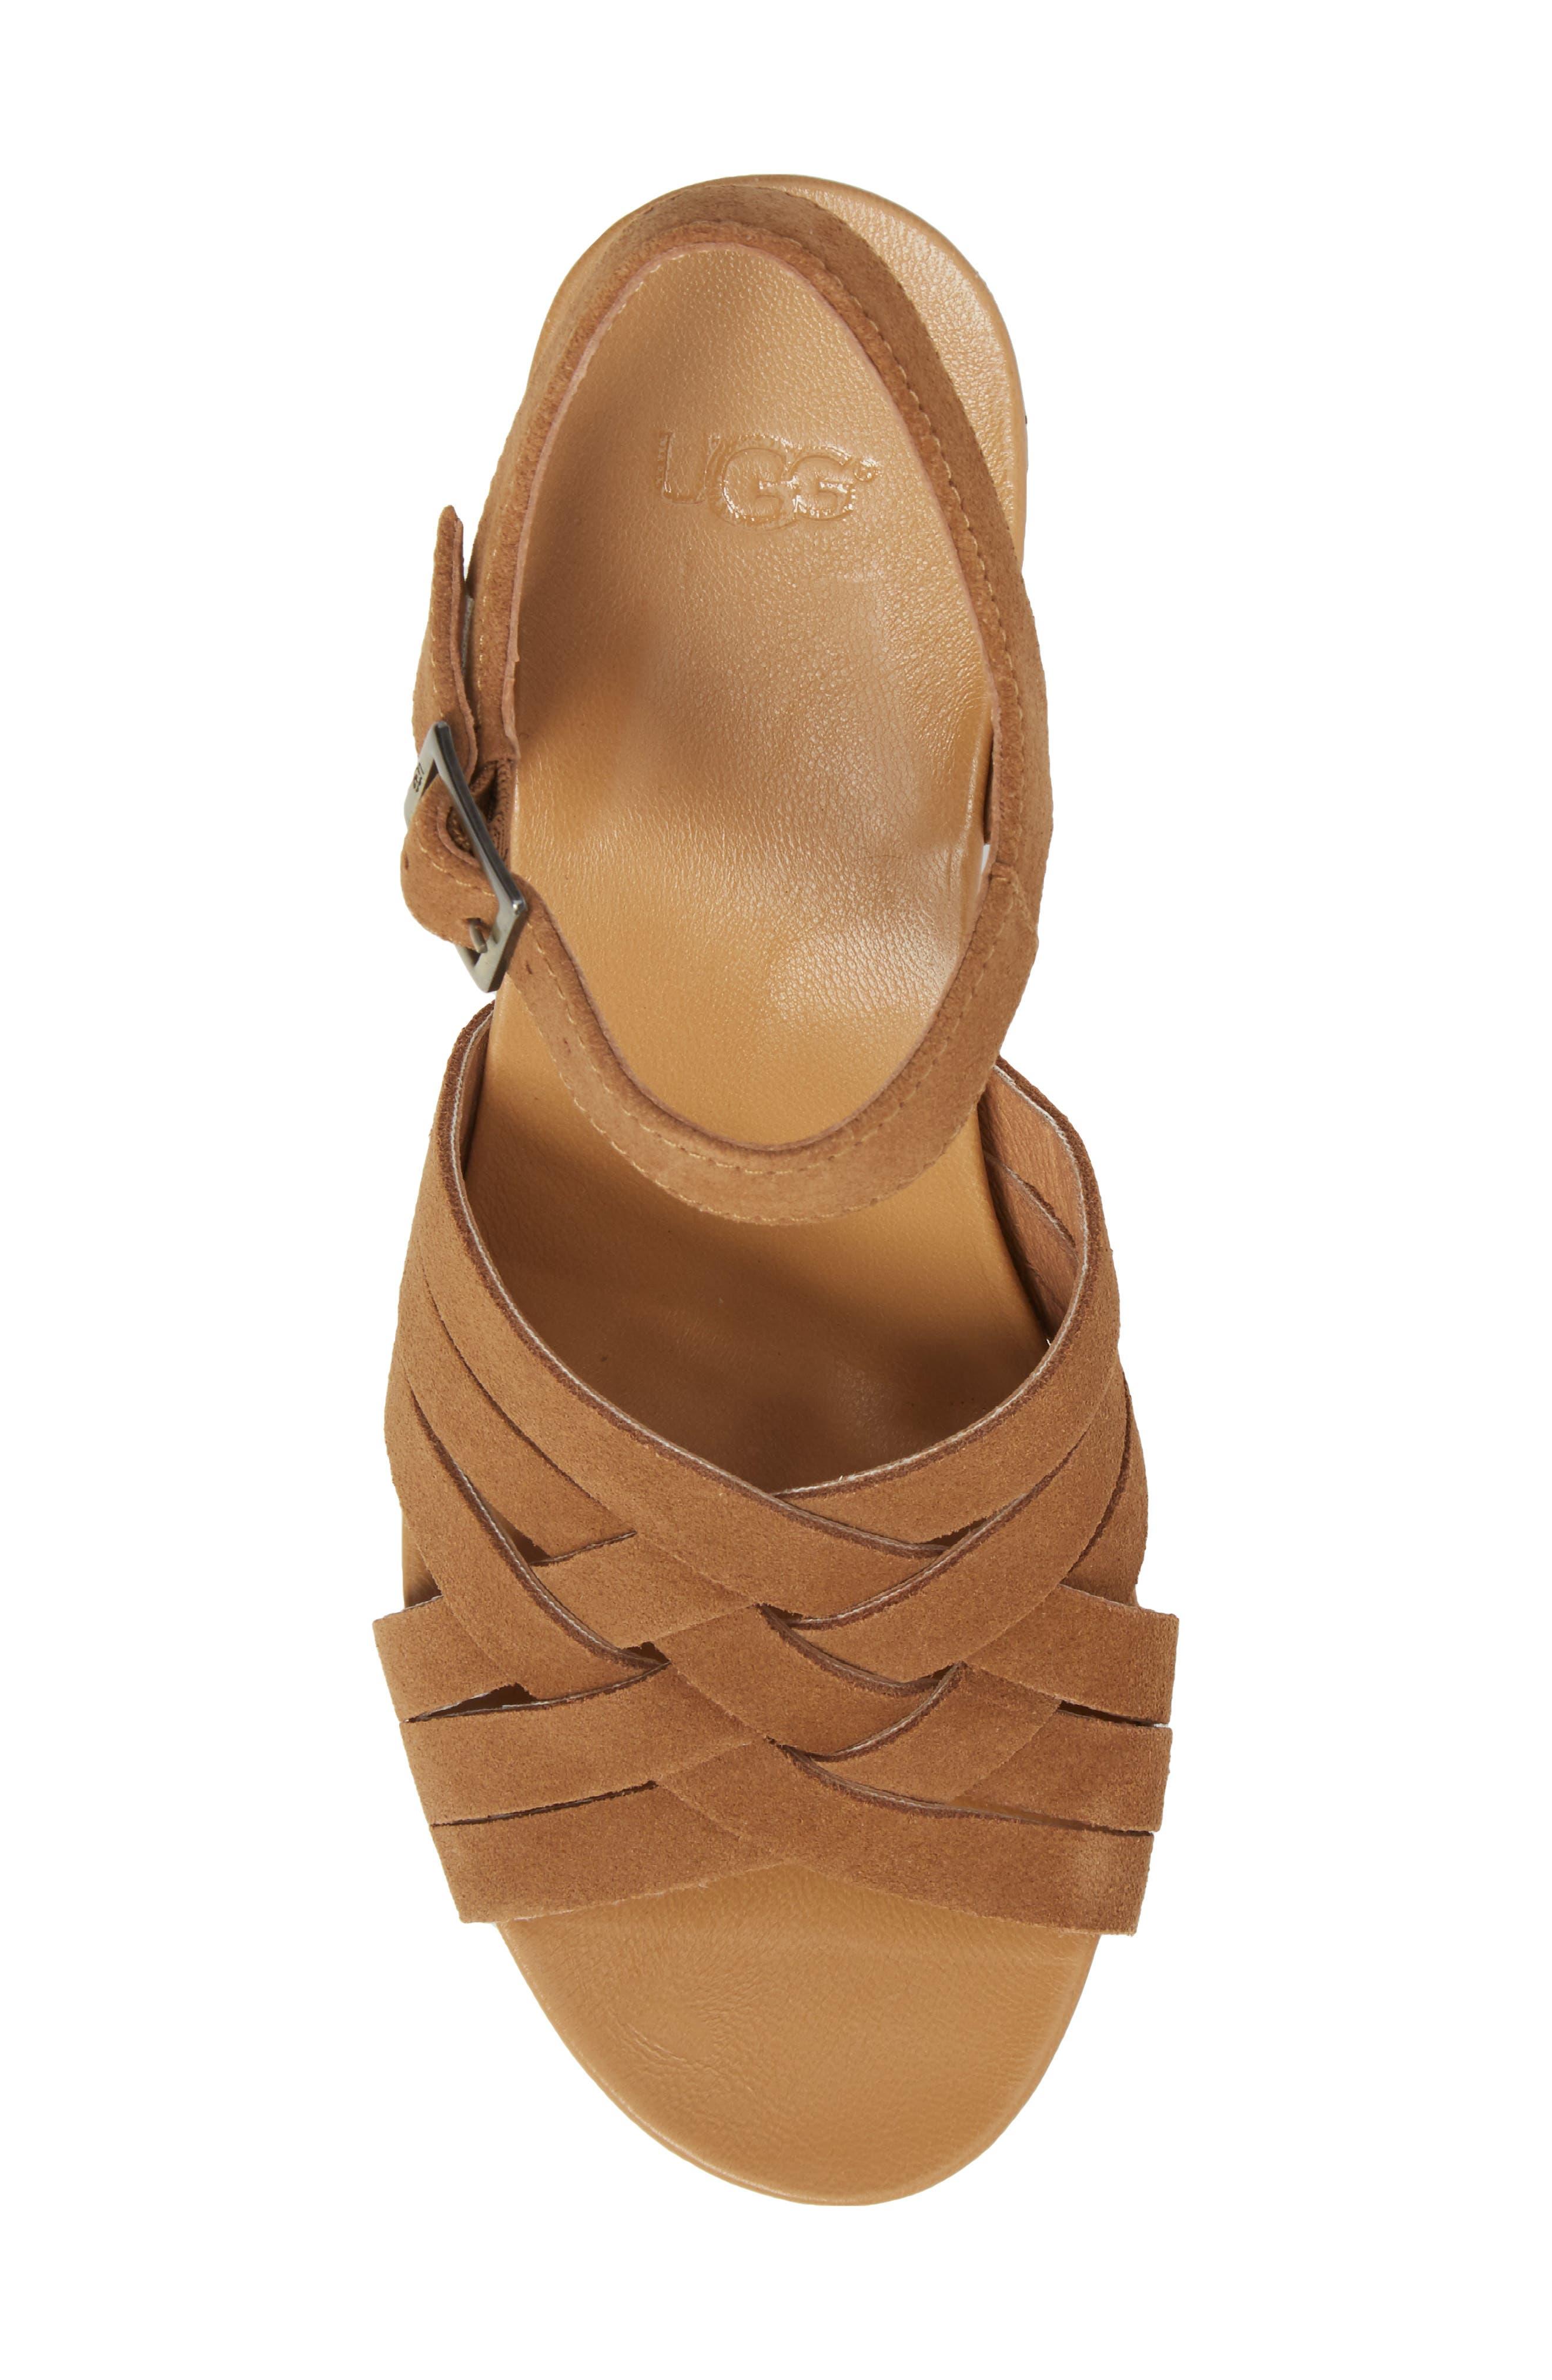 Uma Wedge Sandal,                             Alternate thumbnail 5, color,                             Chestnut Suede